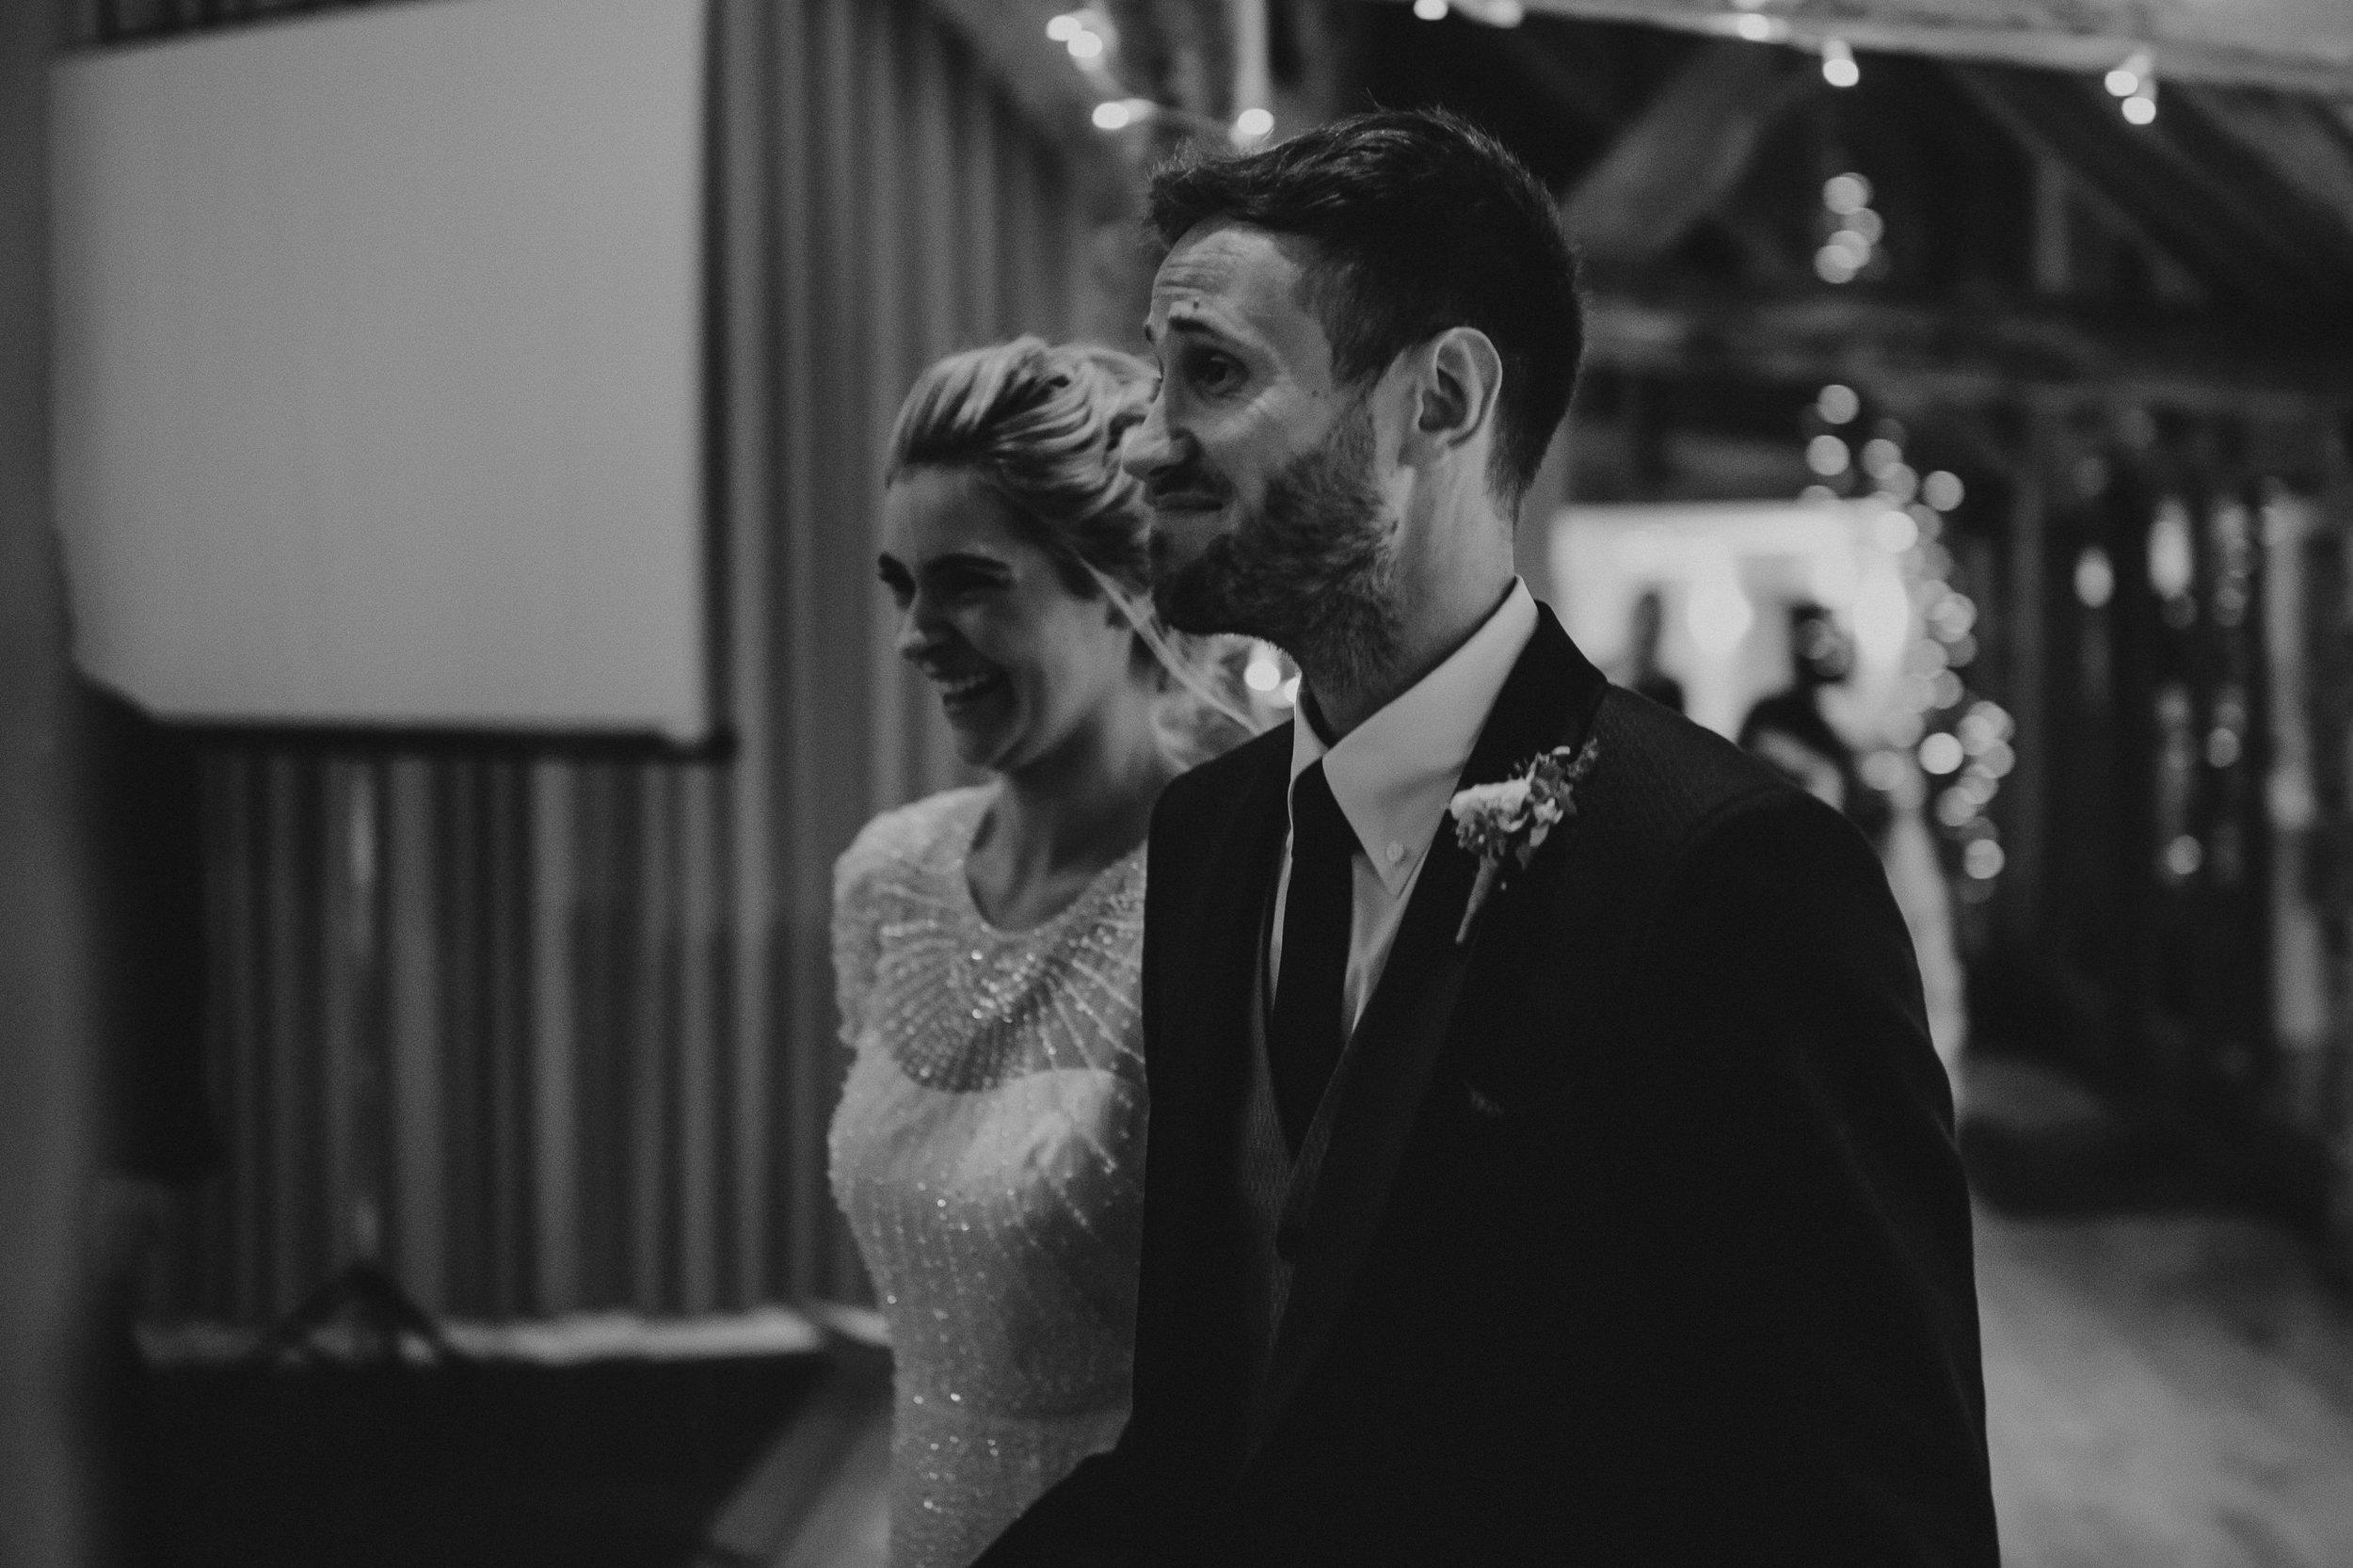 Jenny Packham dress Bury Court Barn Hampshire Wedding Photographer Gione da Silva_014.jpg